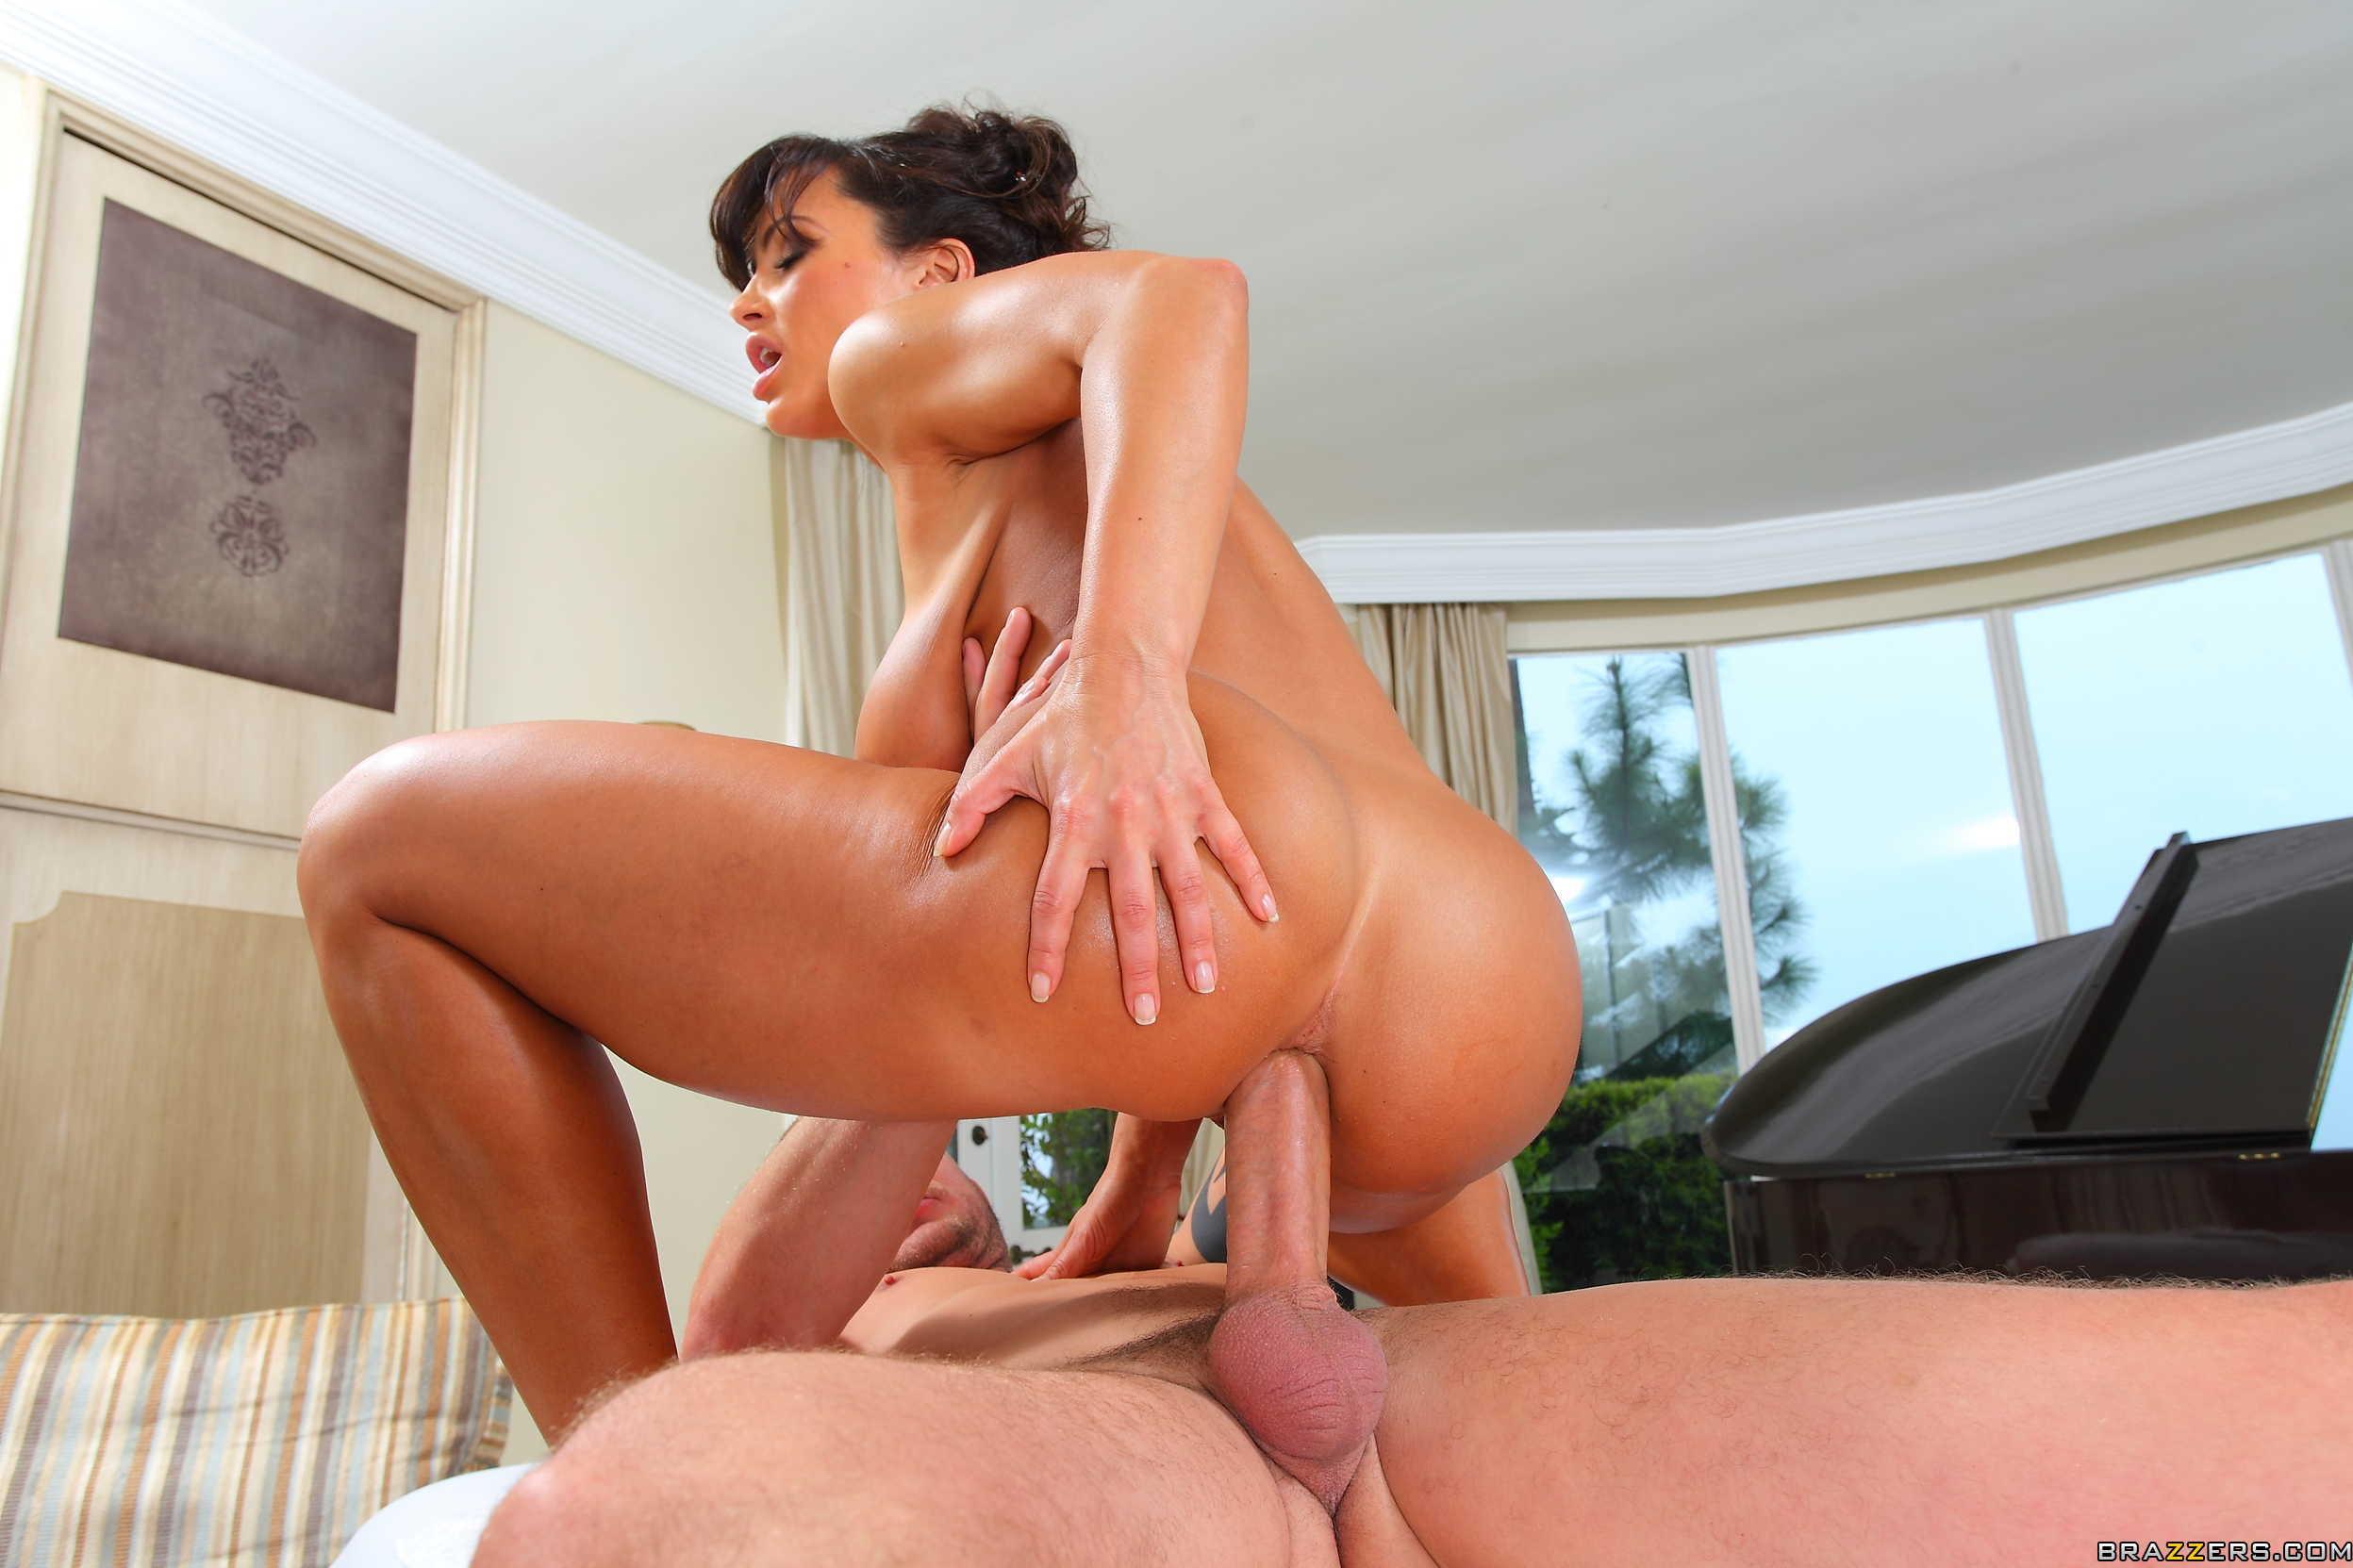 Lisa anna porno anal